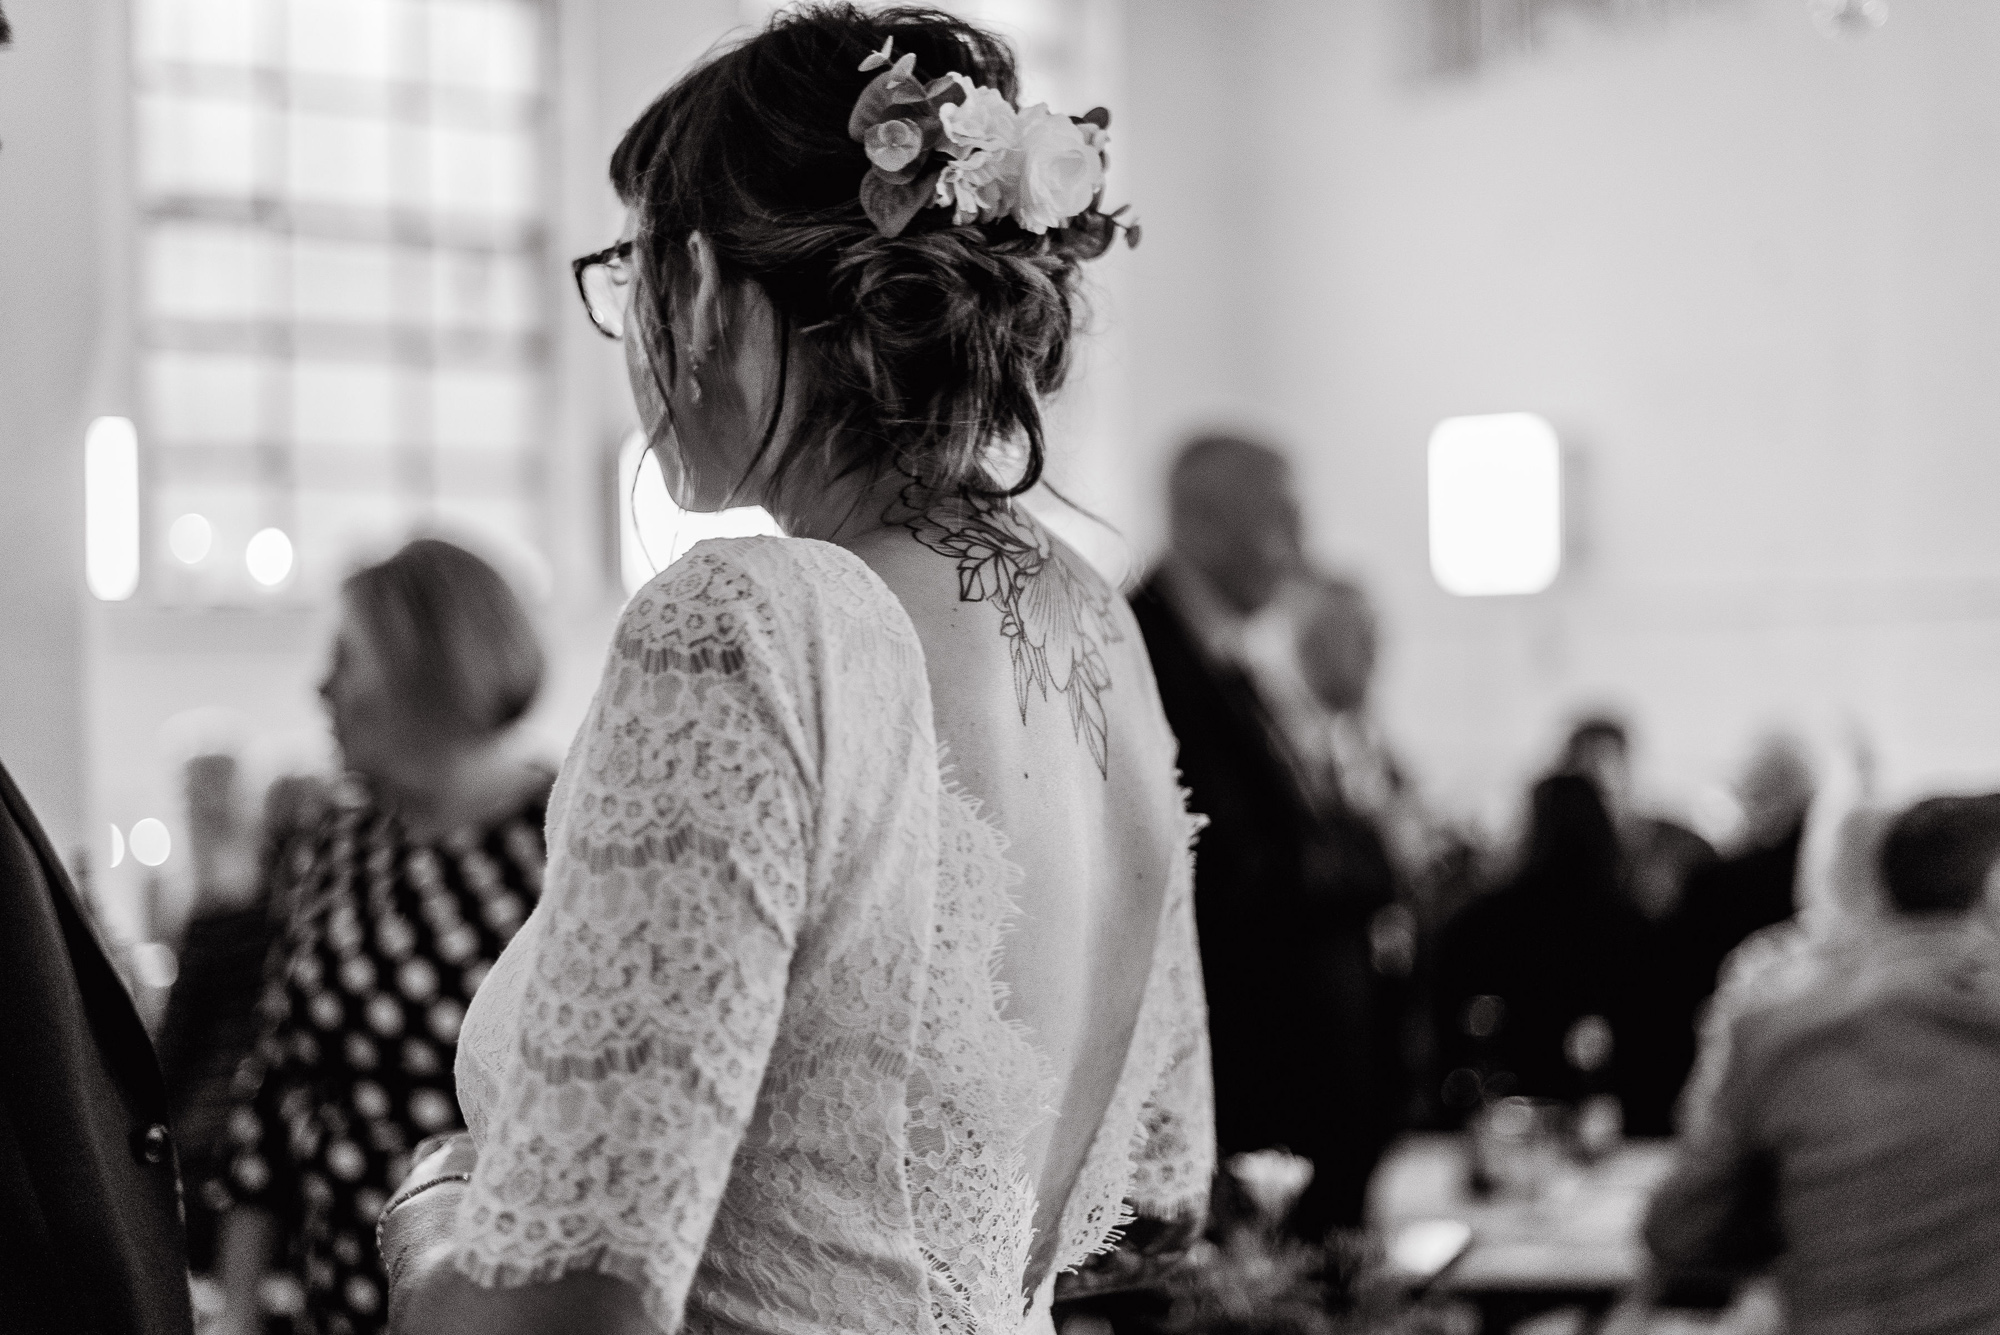 Harriet-Dahlia-Bespoke-Lace-Silk-Bohemian-Wedding-Dress-Sleeves-Tattooed-Bride-Alternative-Wedding-Sheffield-29.jpg